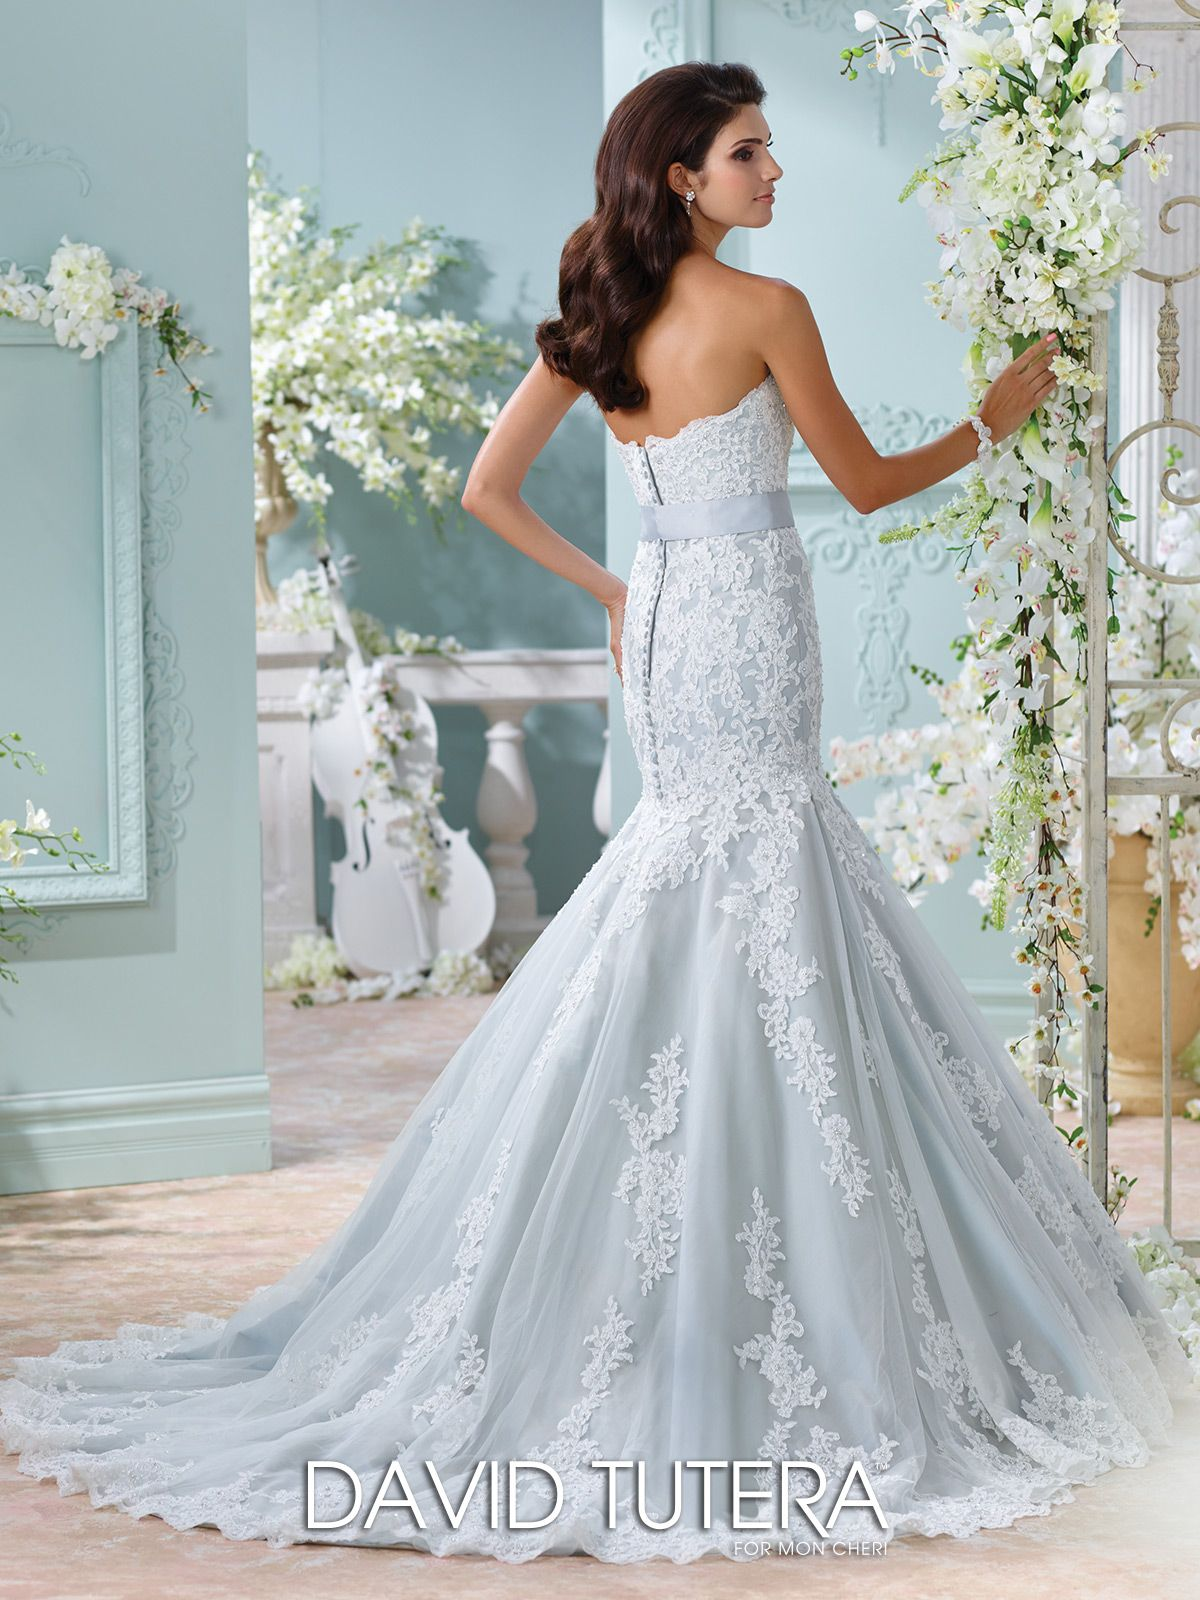 Strapless blue trumpet wedding dress 116225 thea david tutera david tutera for mon cheri 116225 thea strapless blue wedding dress tulle ombrellifo Images